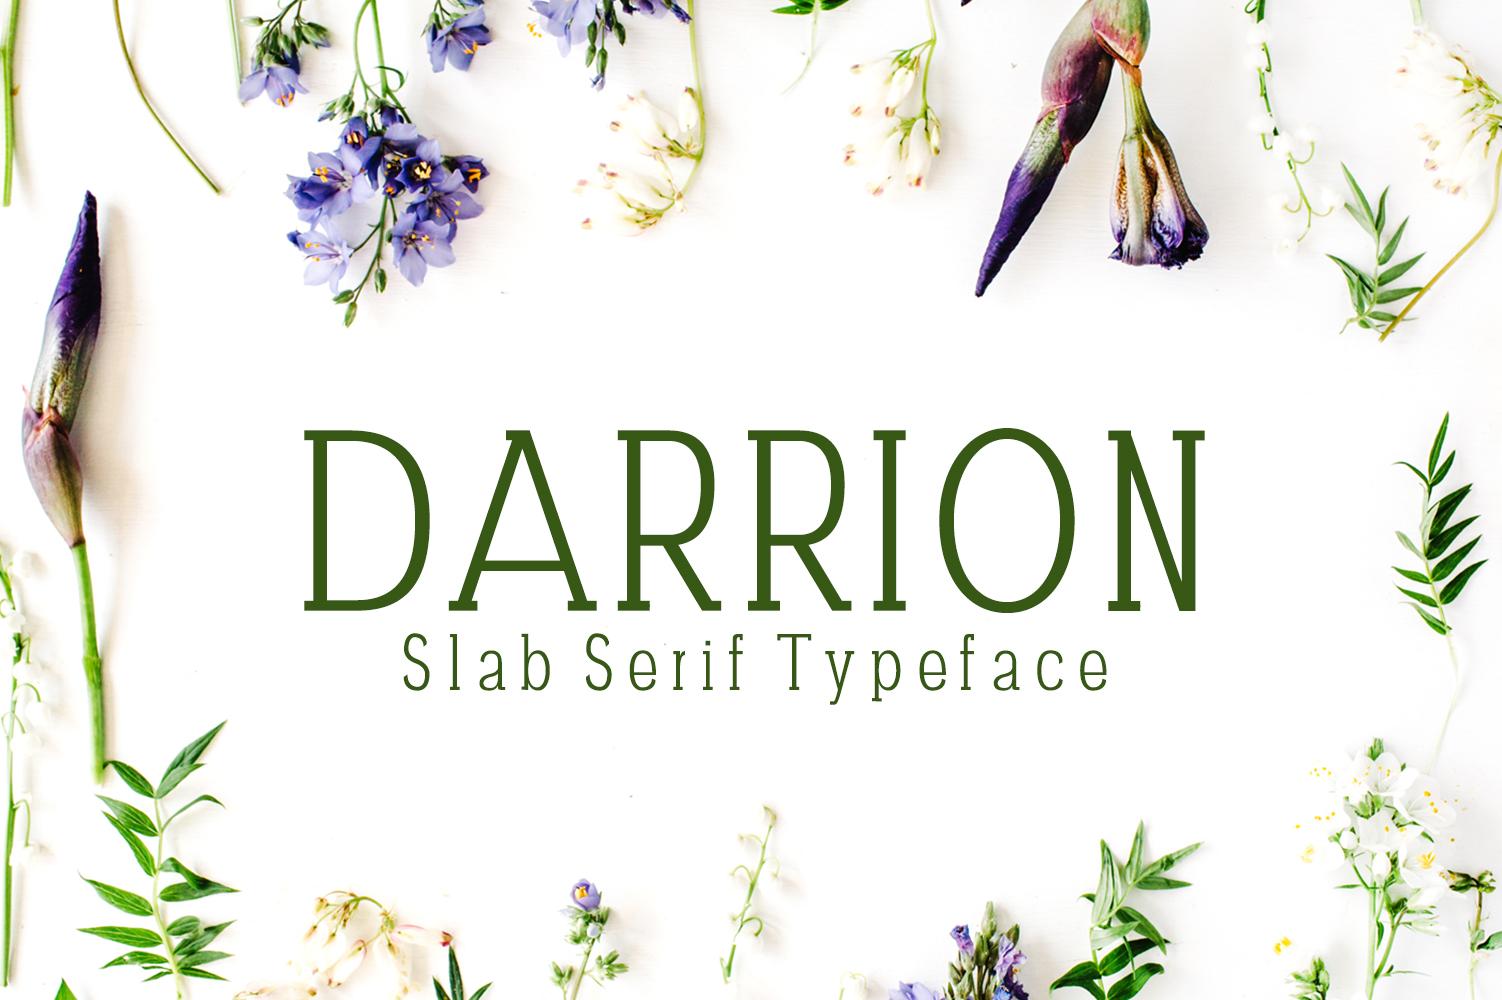 Darrion Slab Serif Typeface example image 1